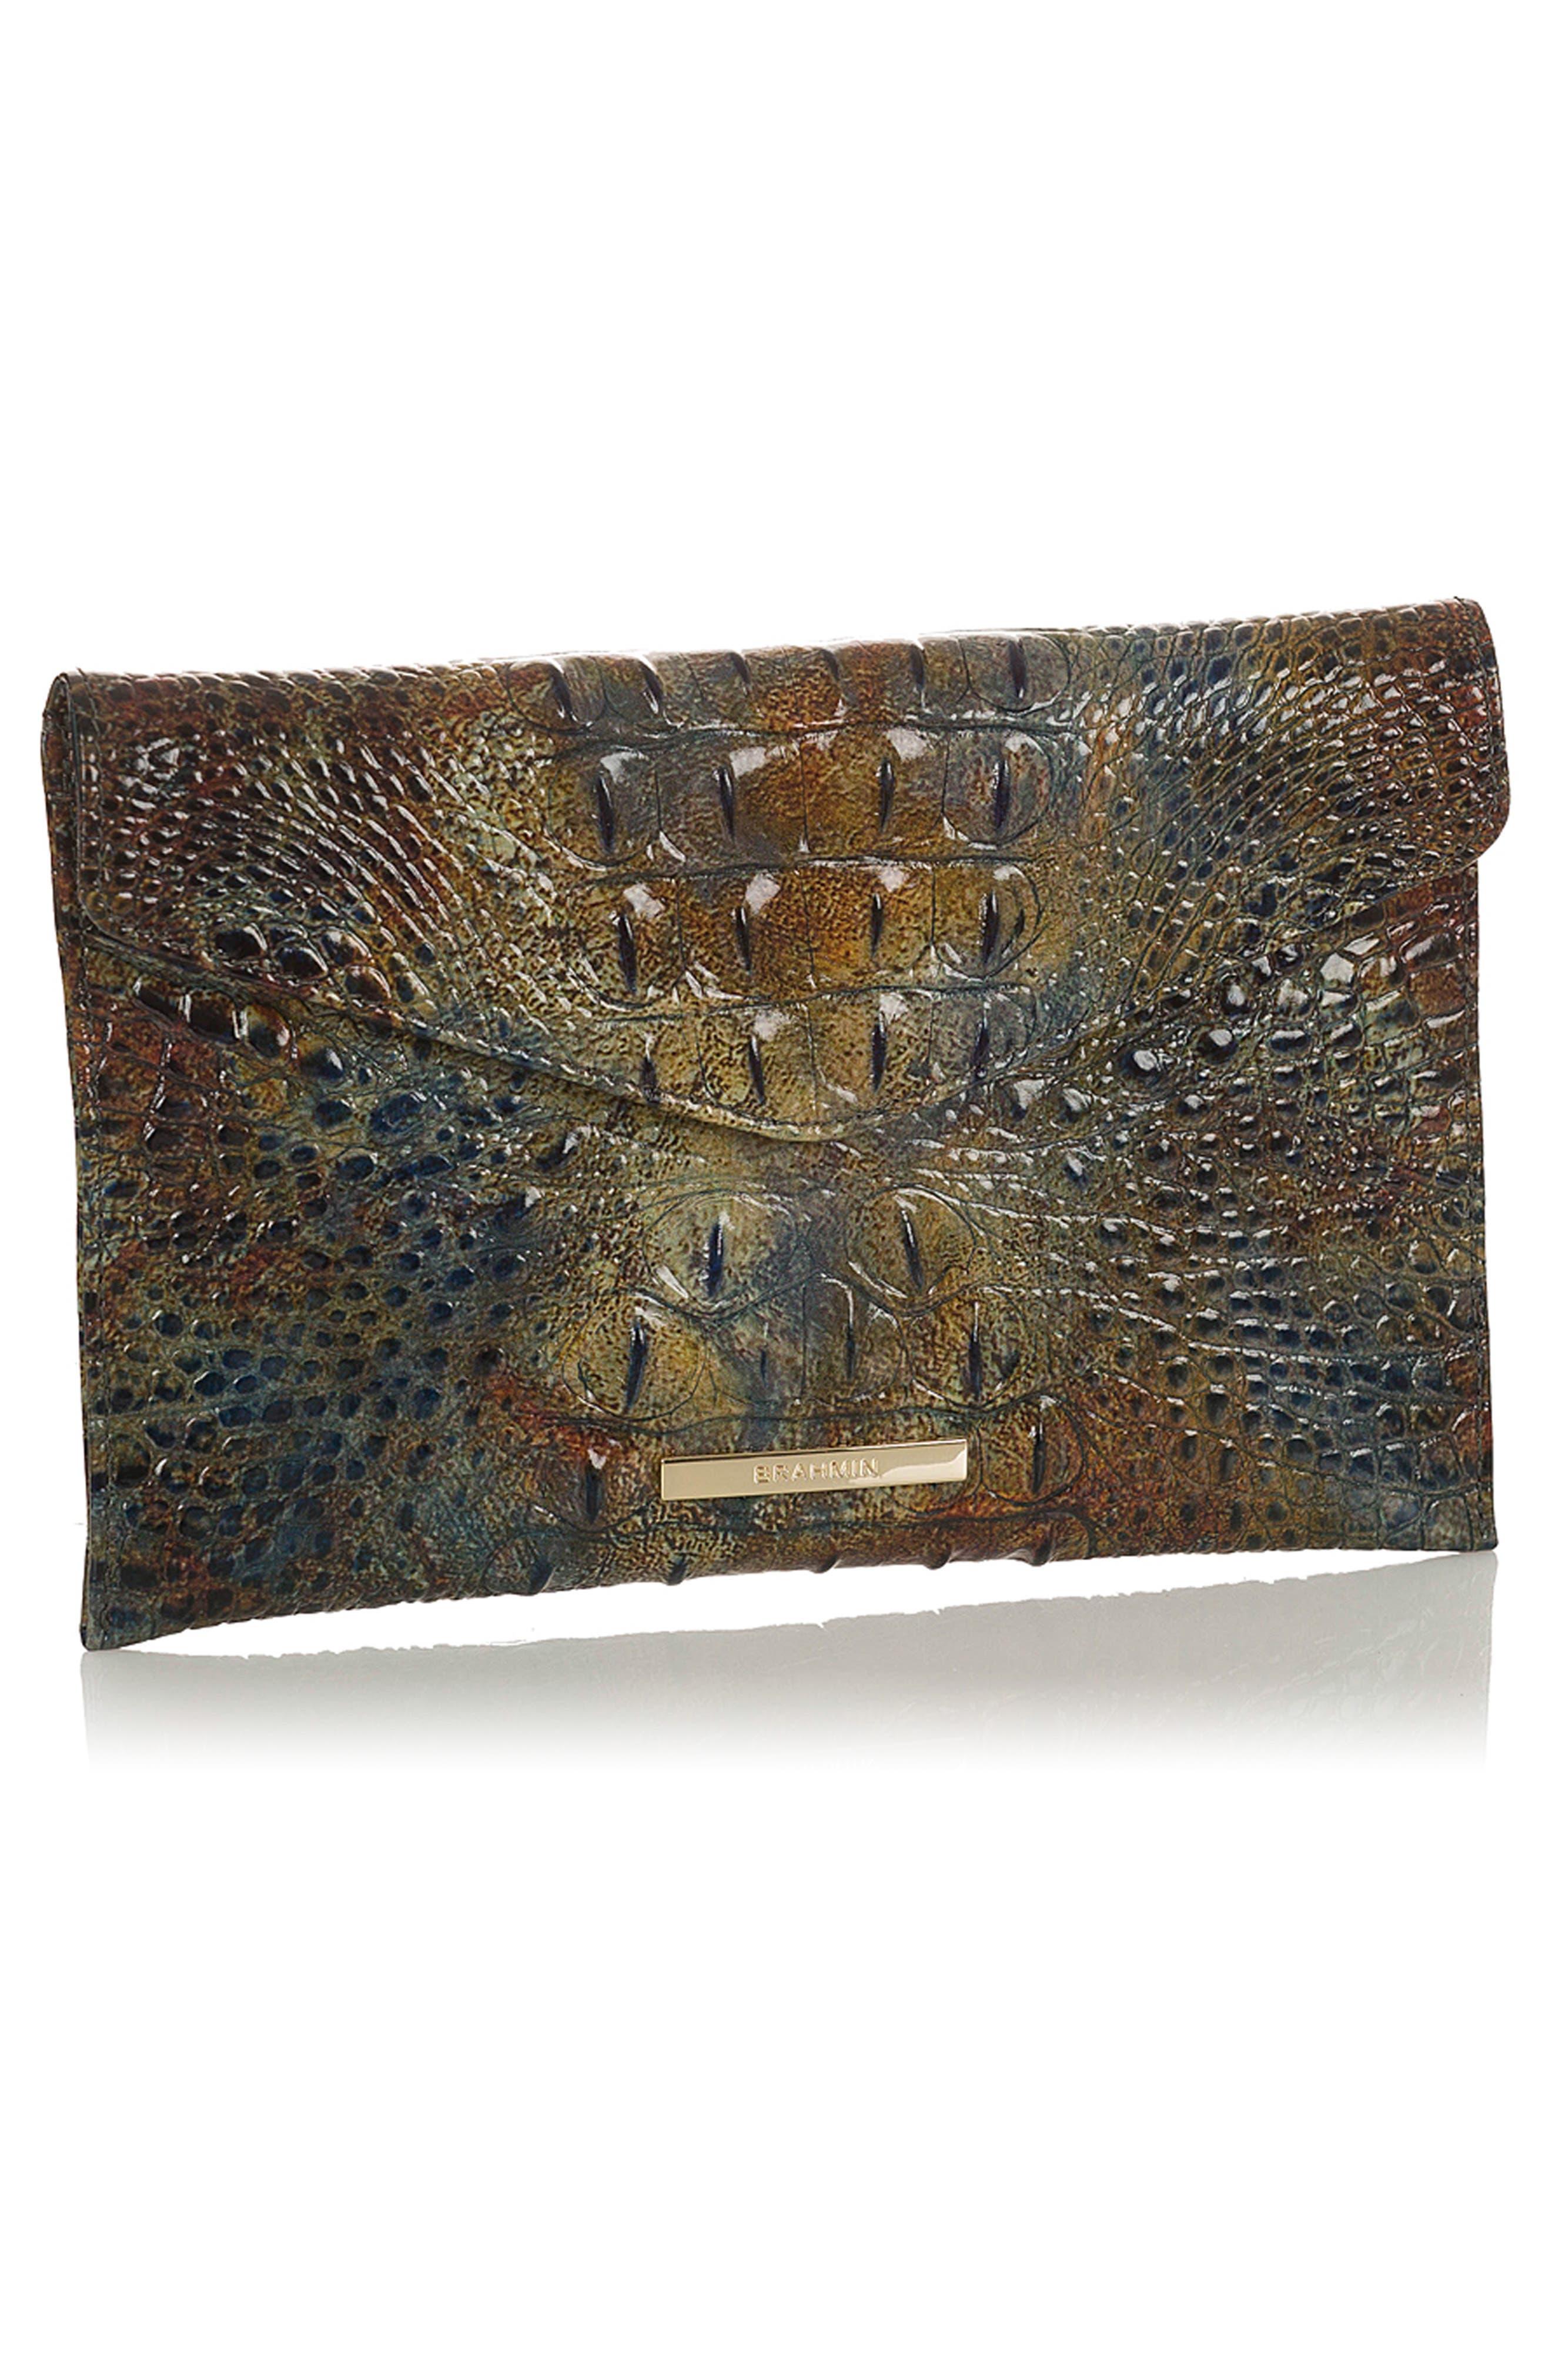 BRAHMIN,                             Melbourne Croc Embossed Leather Envelope Clutch,                             Alternate thumbnail 4, color,                             204